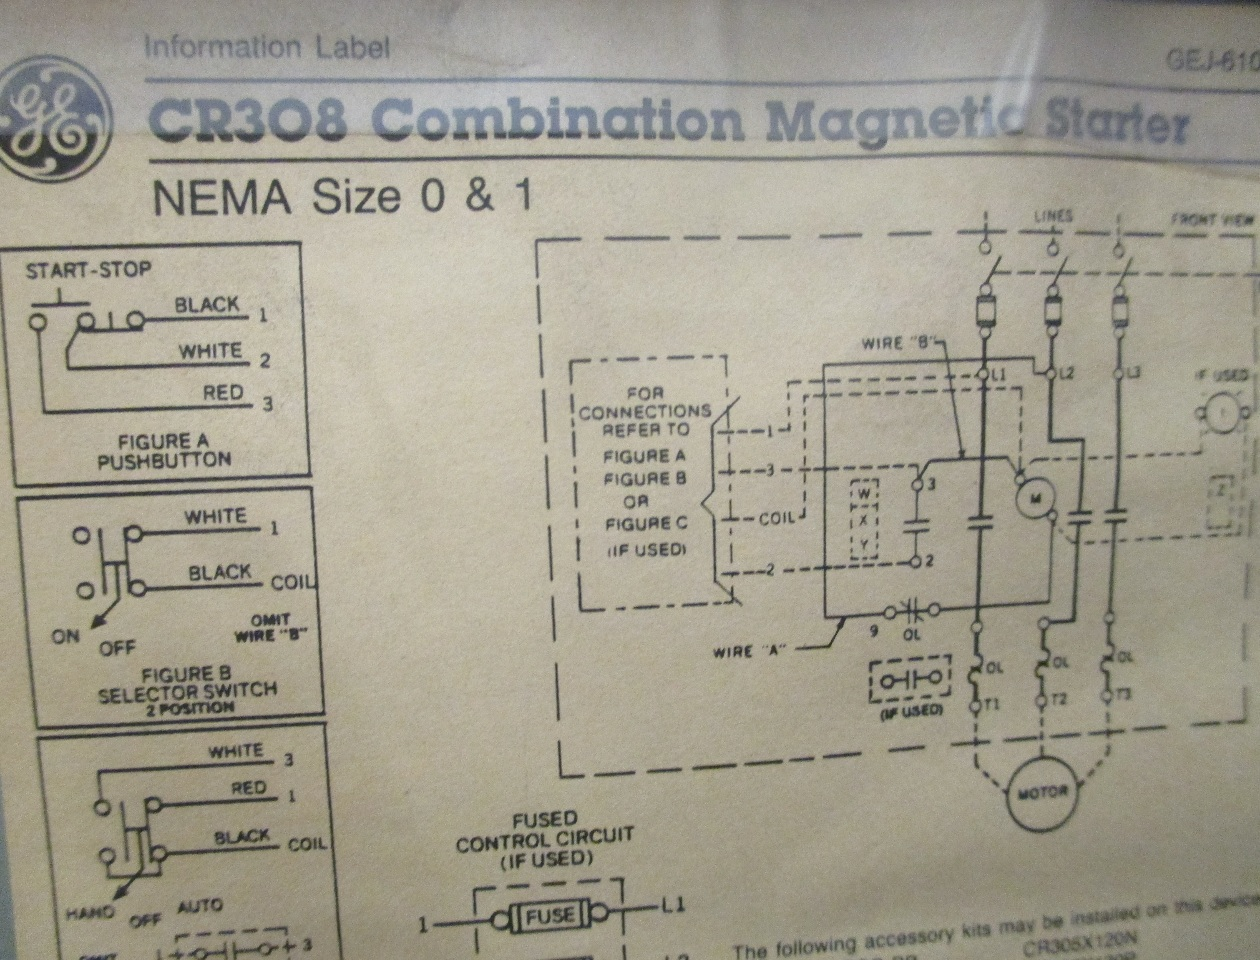 Ge 300 Line Control Wiring Diagram - 120 Volt Motor Starter Coil Wiring  Diagram - 5pin.tukune.jeanjaures37.fr | Ge Magnetic Starter Wiring Diagrams |  | Wiring Diagram Resource